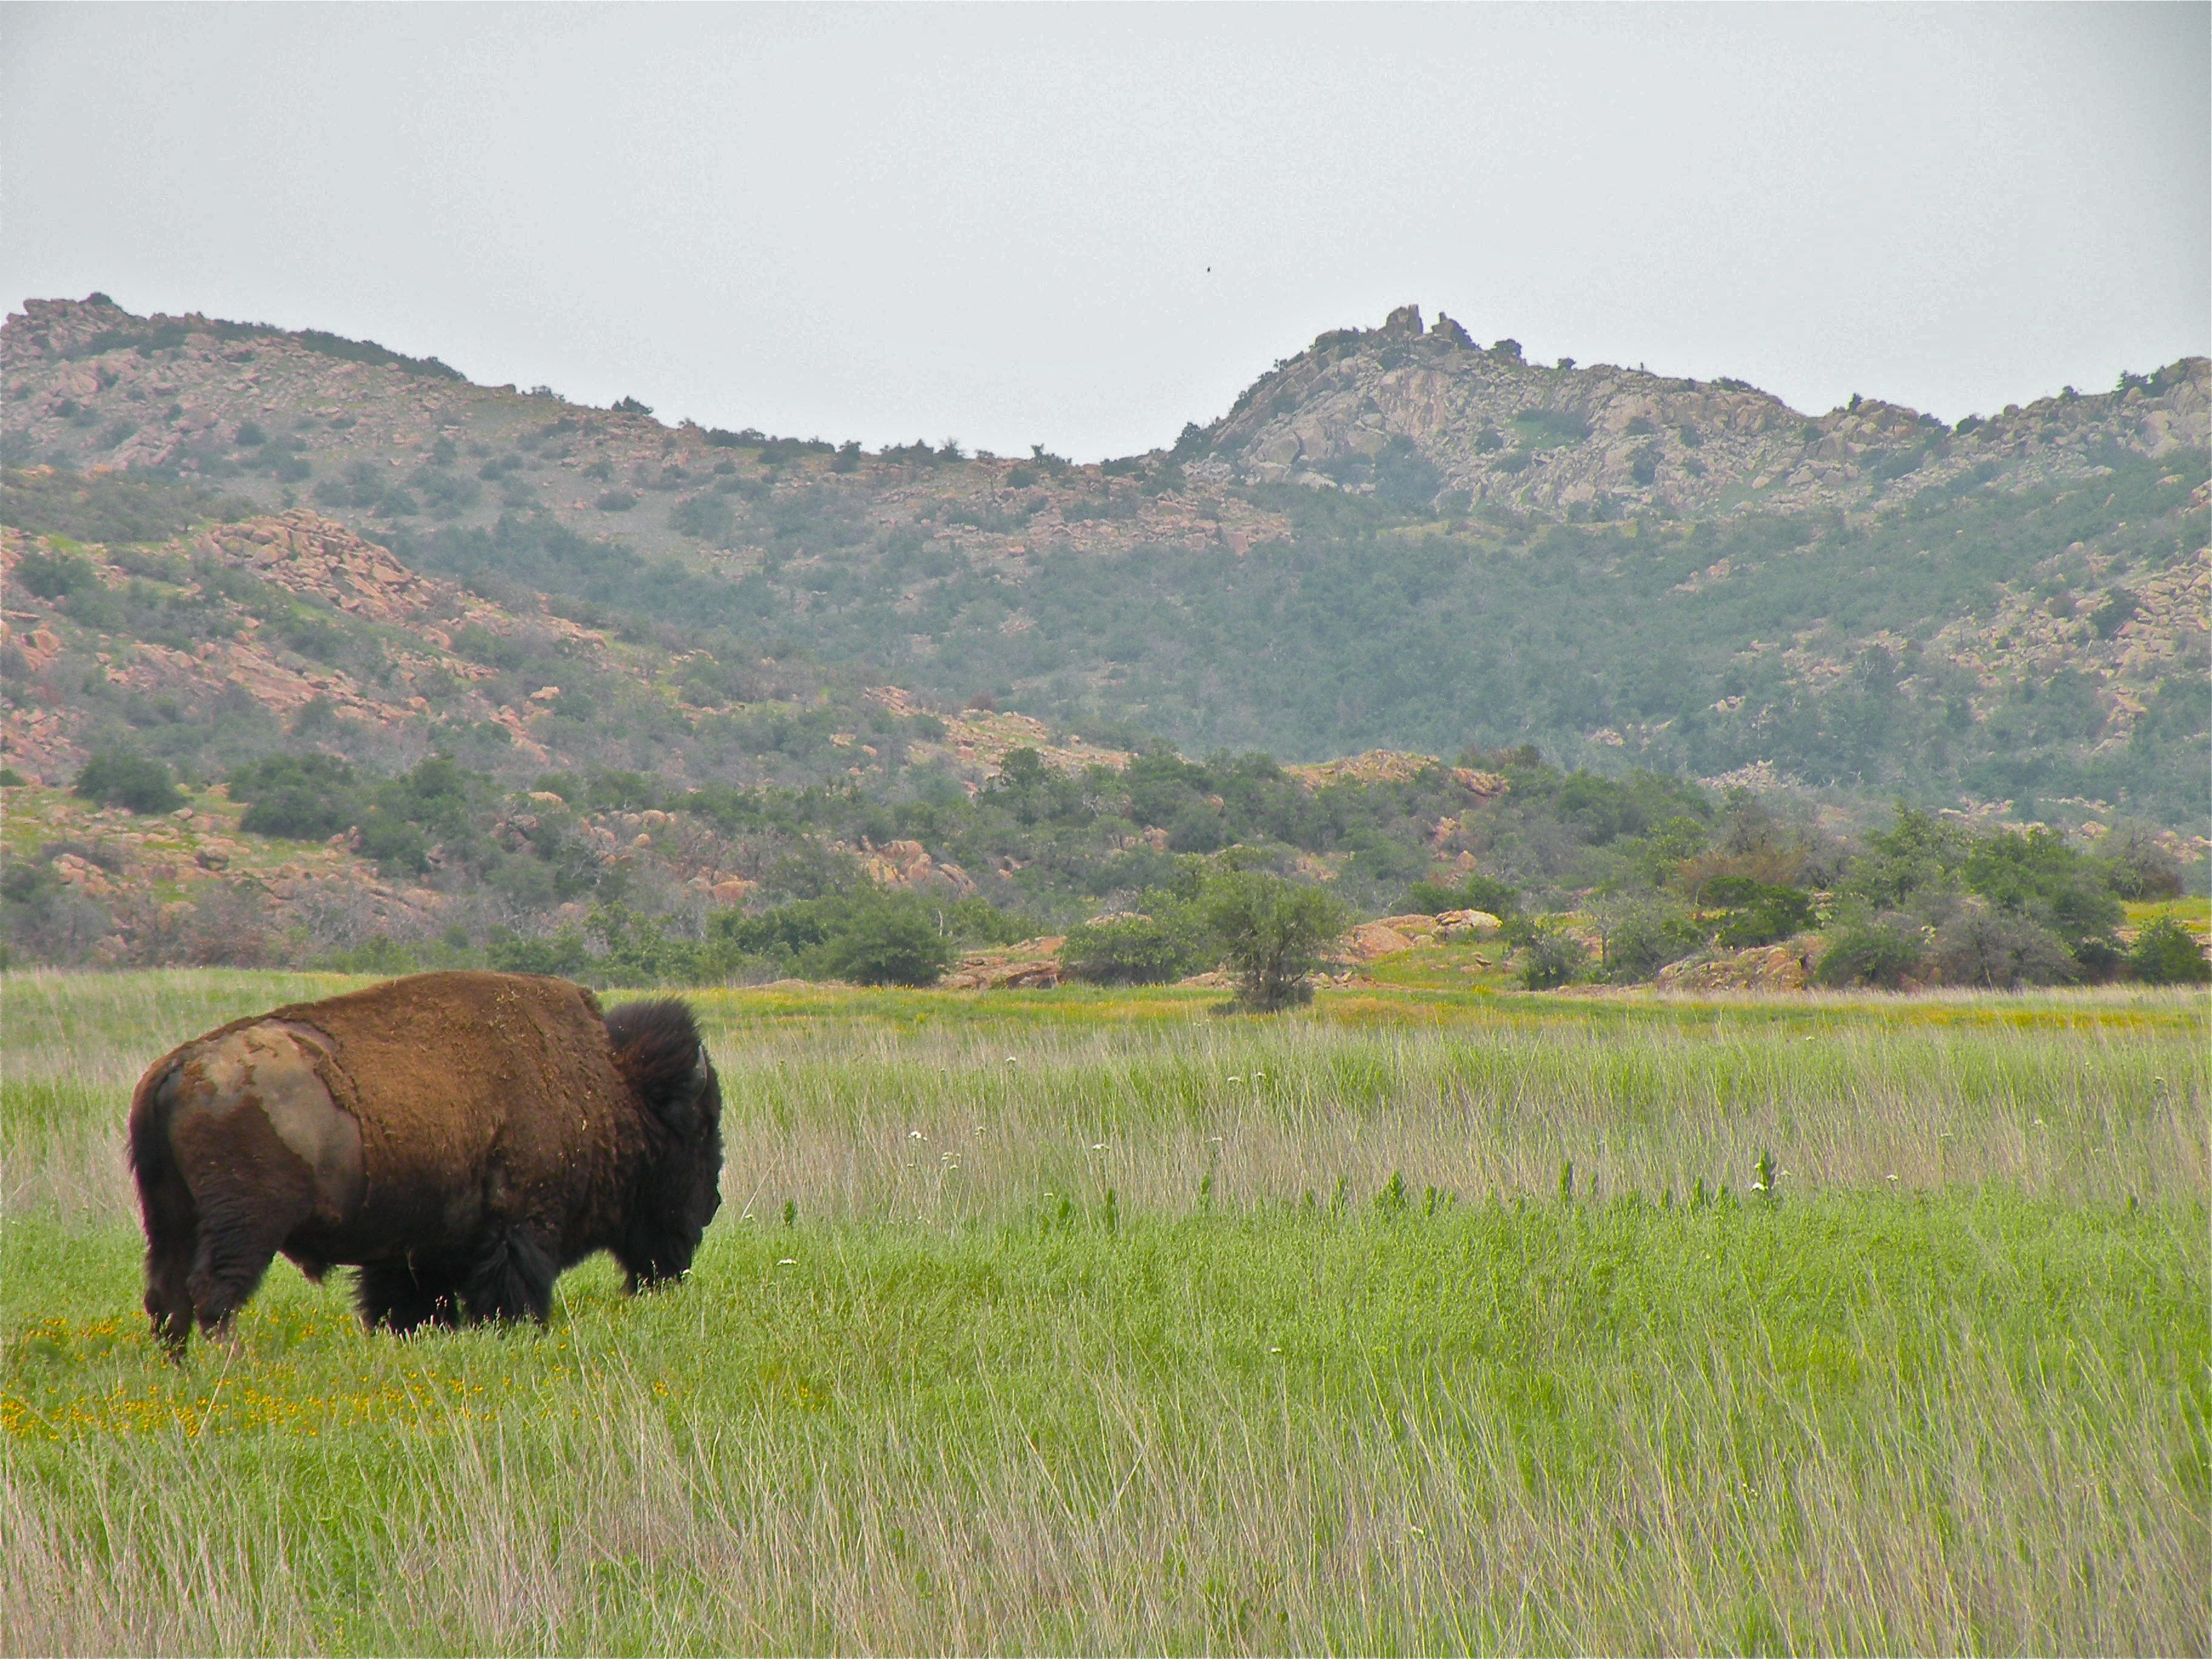 Wichita Mountains National Wildlife Refuge, near Lawton, Oklahoma Buffalo and Longhorn Cattle roam free kristin nador writes anywhere blog